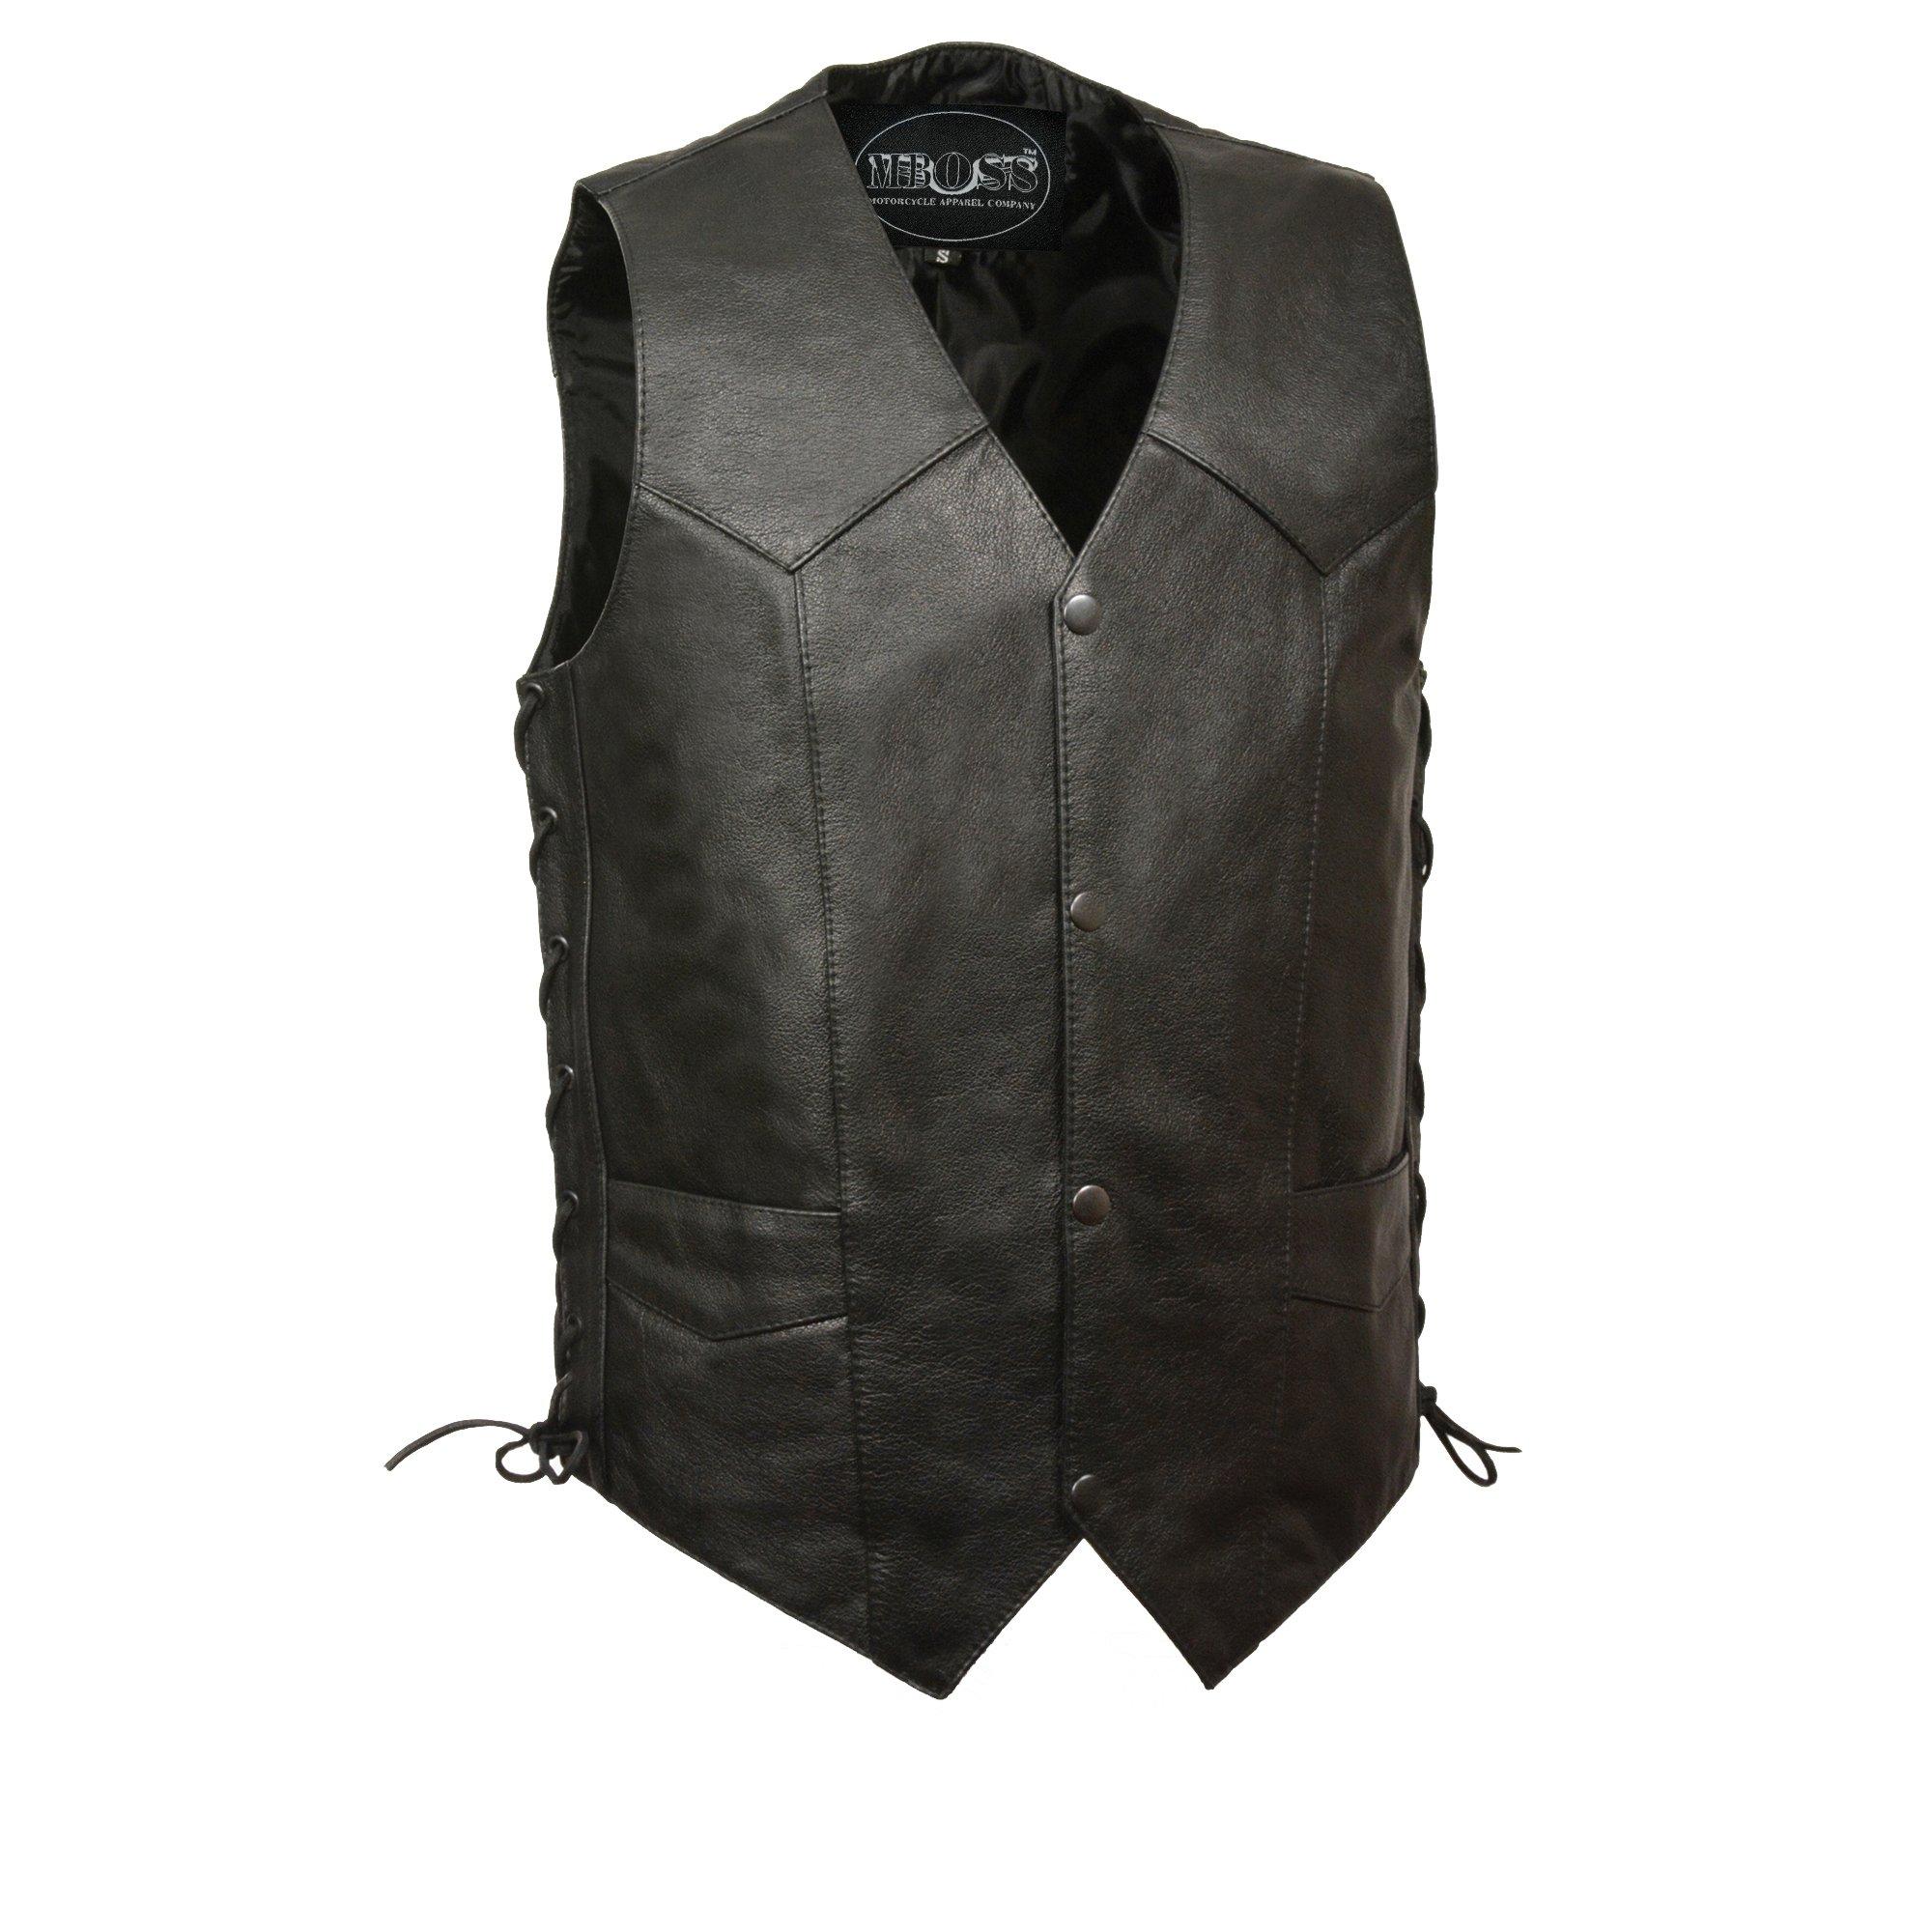 M-BOSS MOTORCYCLE APPAREL-BOS13515-BLACK-Men's concealed carry single back panel classic biker leather vest.-BLACK-38